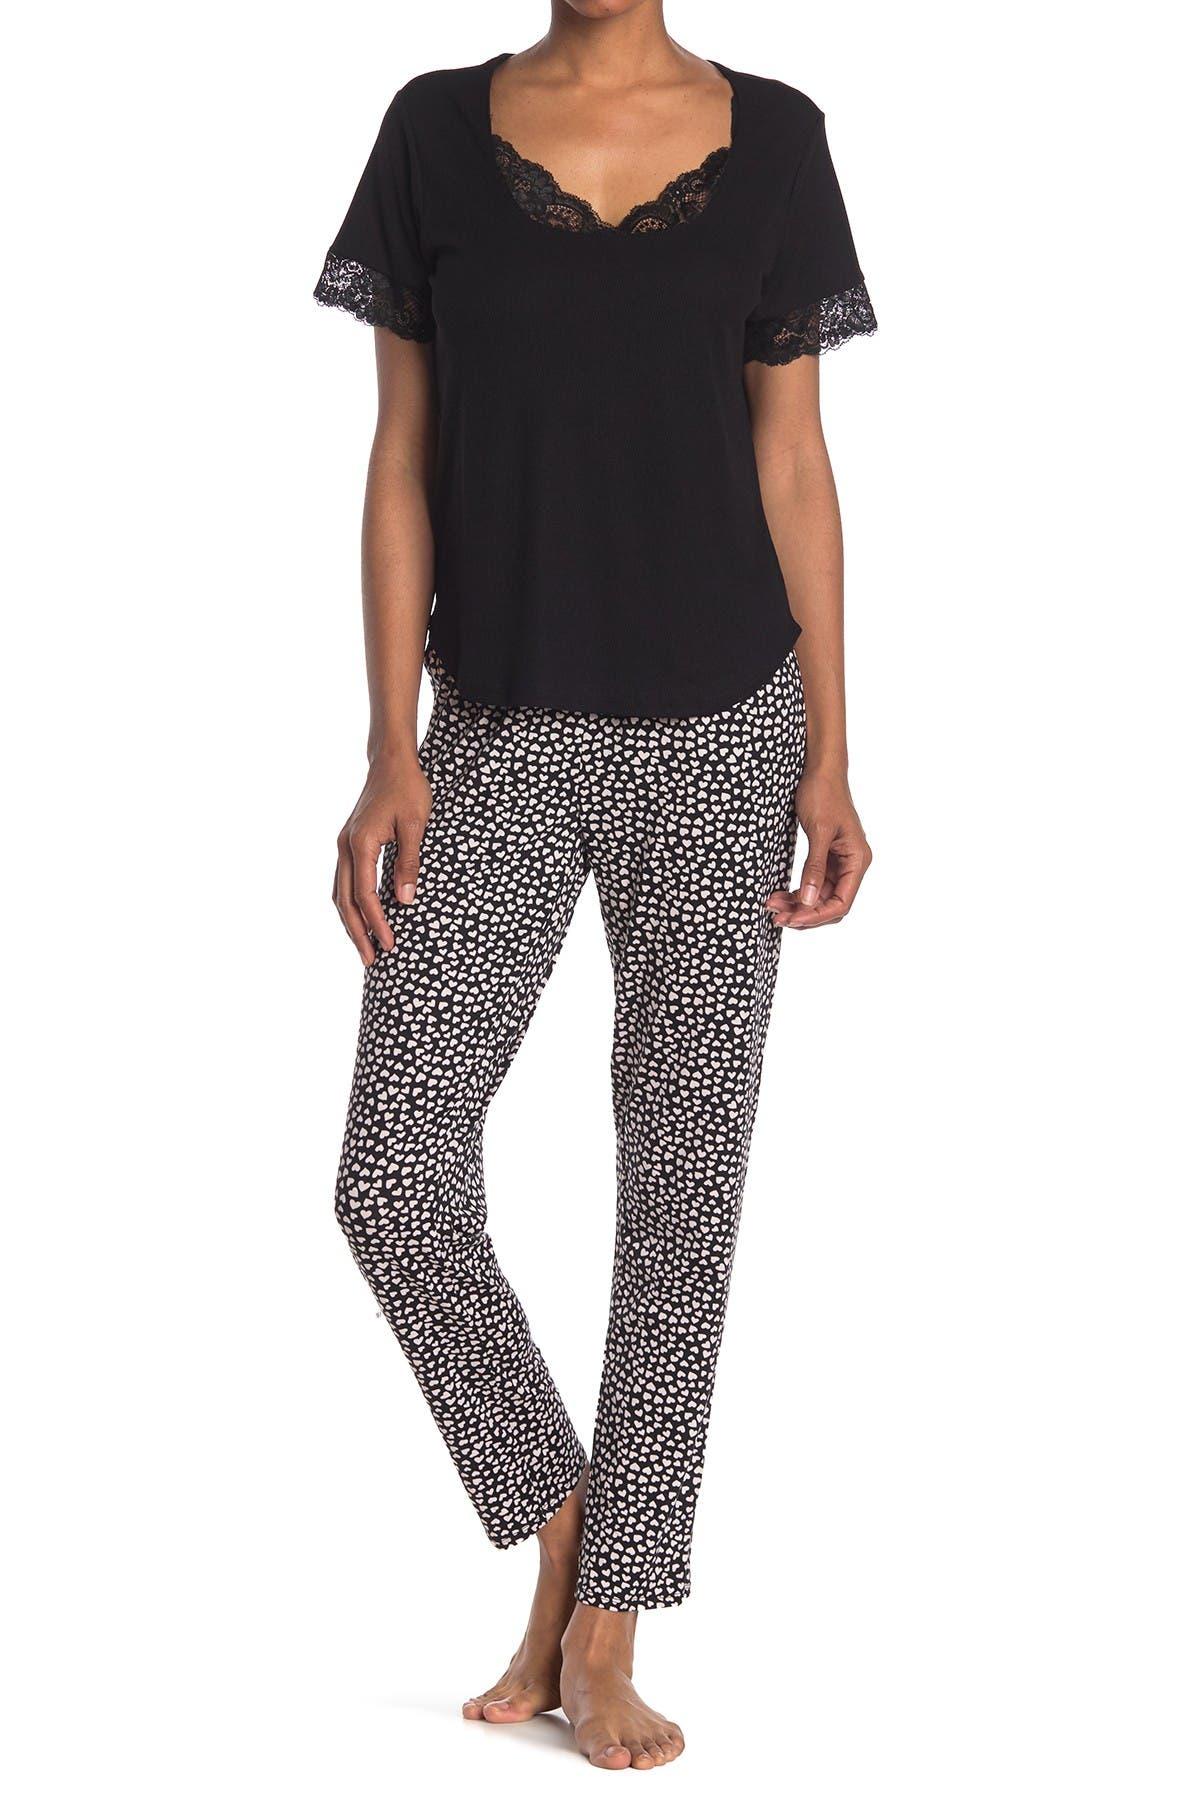 Image of Flora by Flora Nikrooz Lexie Lace Trim Top & Heart Print Pants 2-Piece Pajama Set